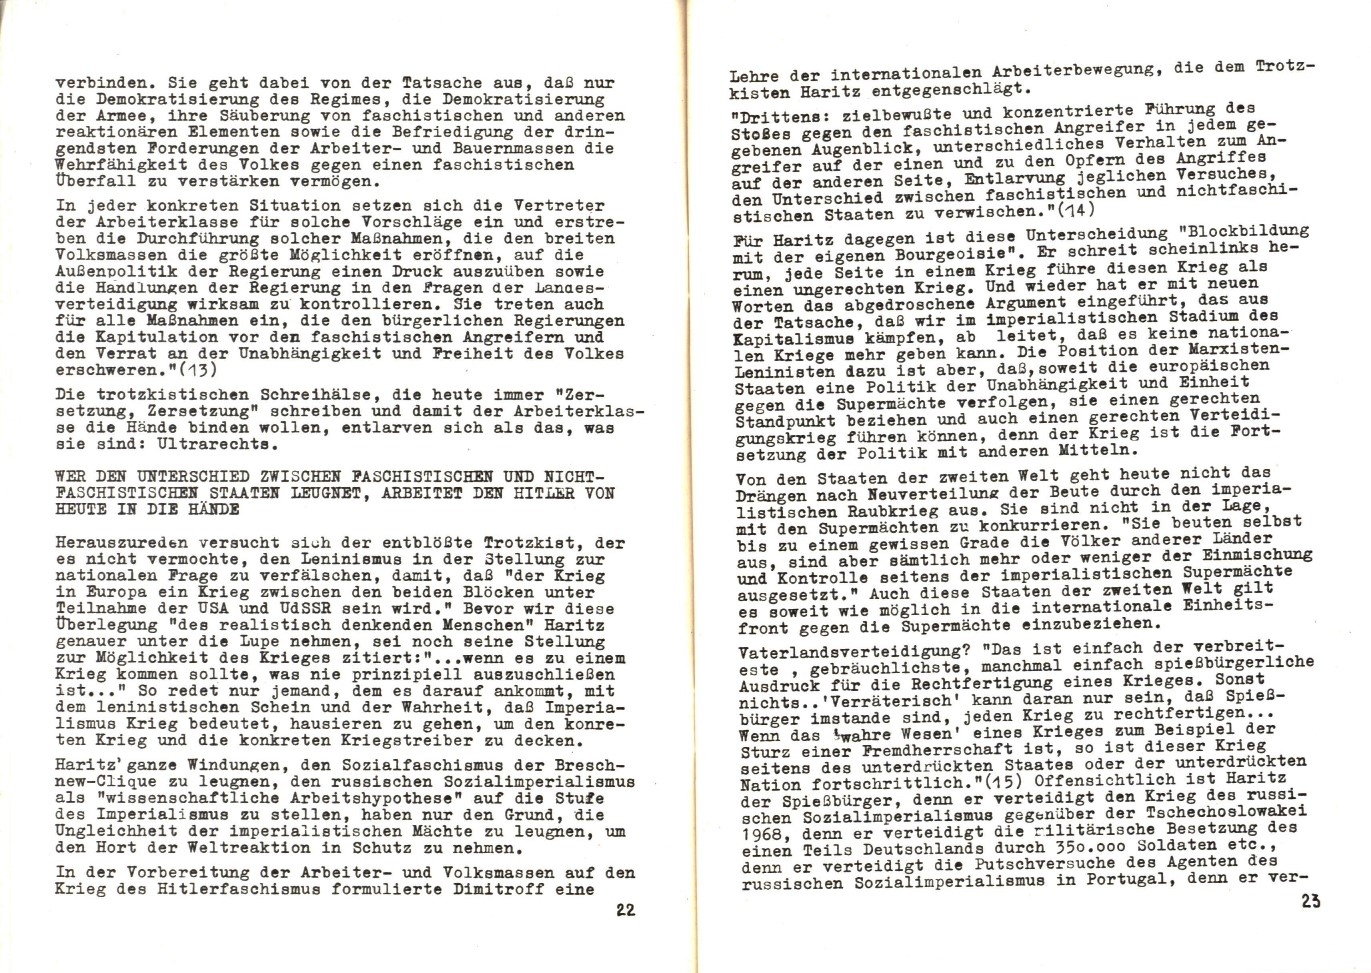 Berlin_KSV_1975_Dokumente_der_SAZ_13